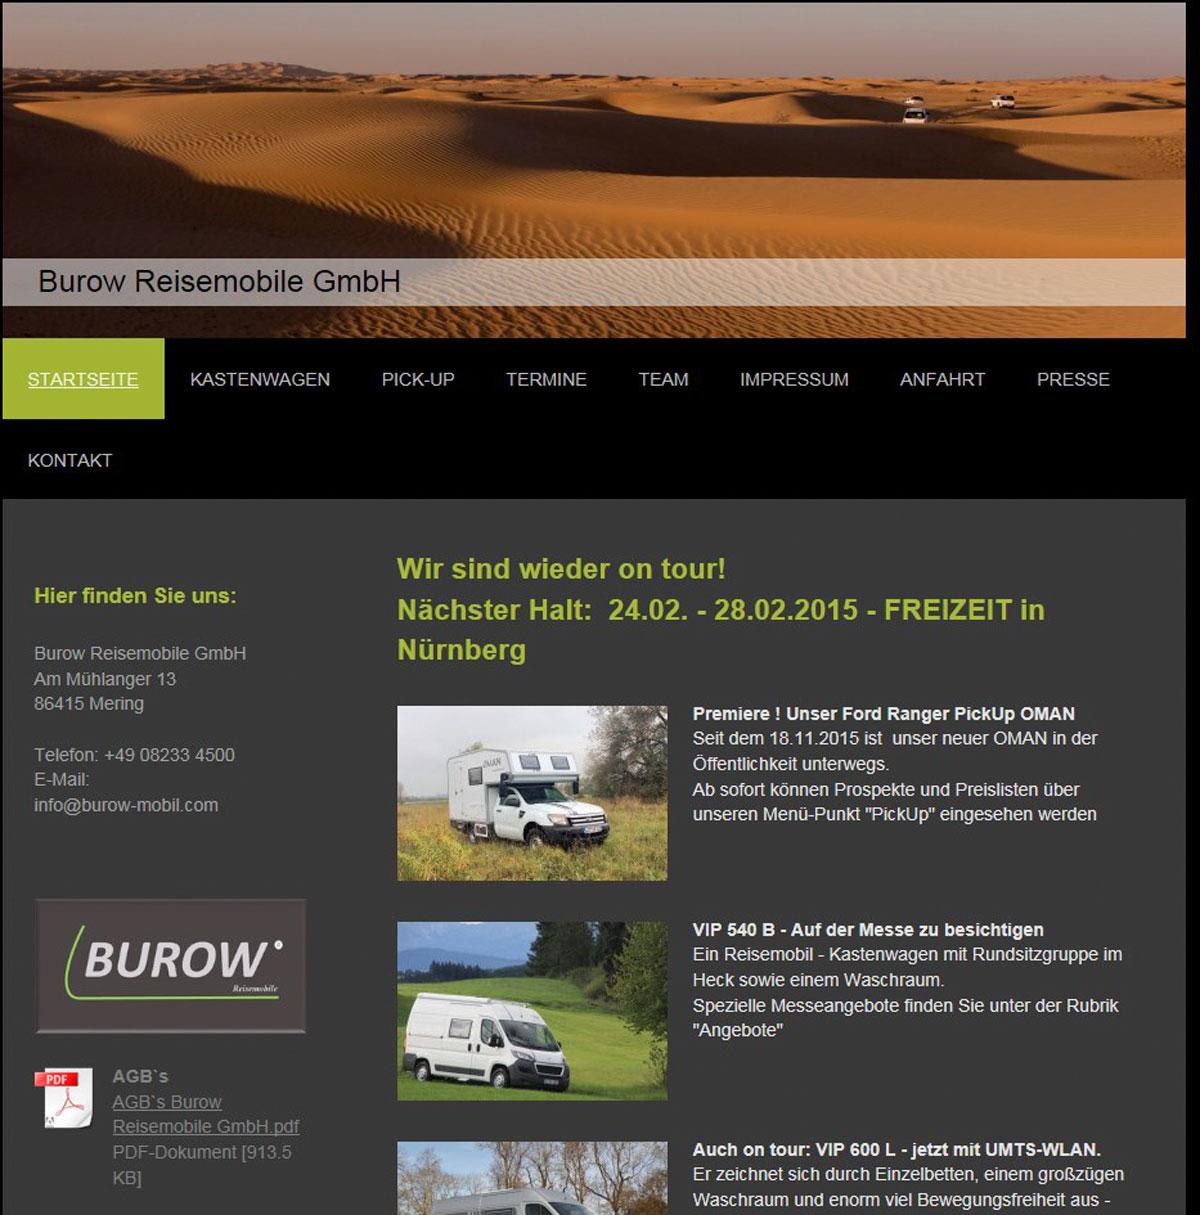 Burow Reisemobile